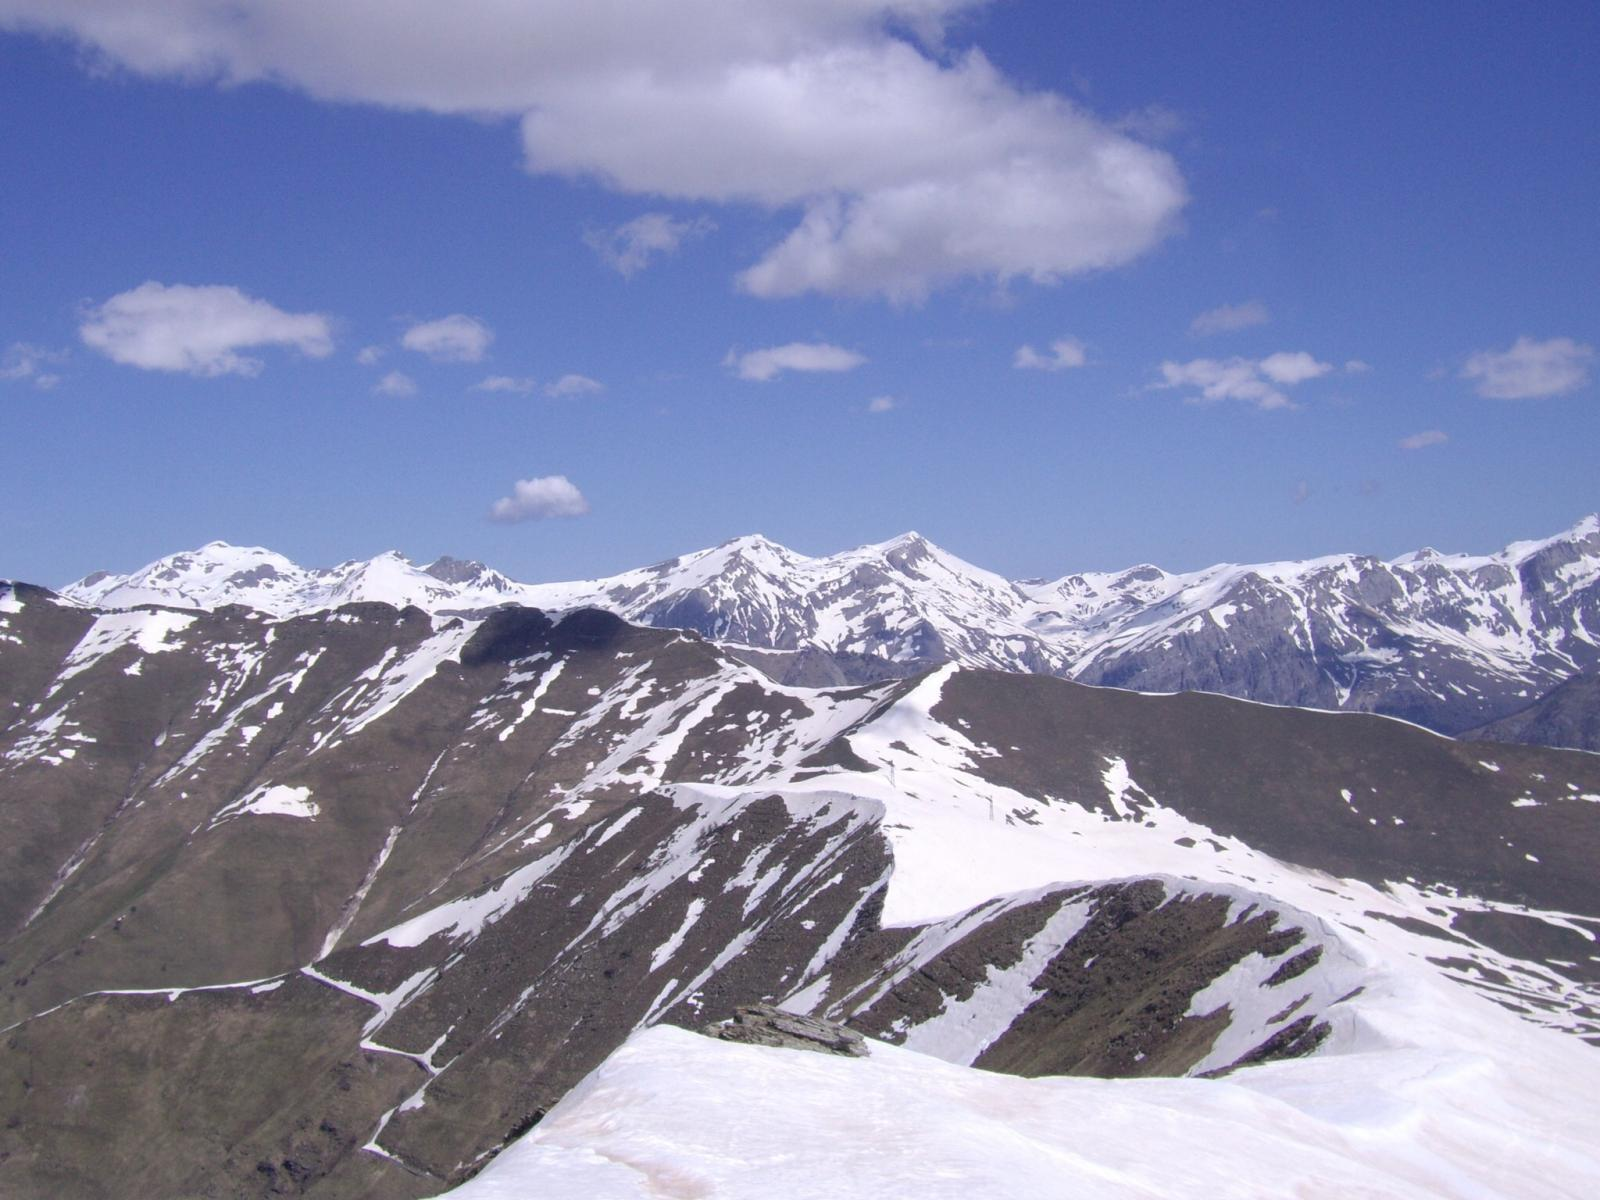 ancora tanta neve sulle Alpi liguri